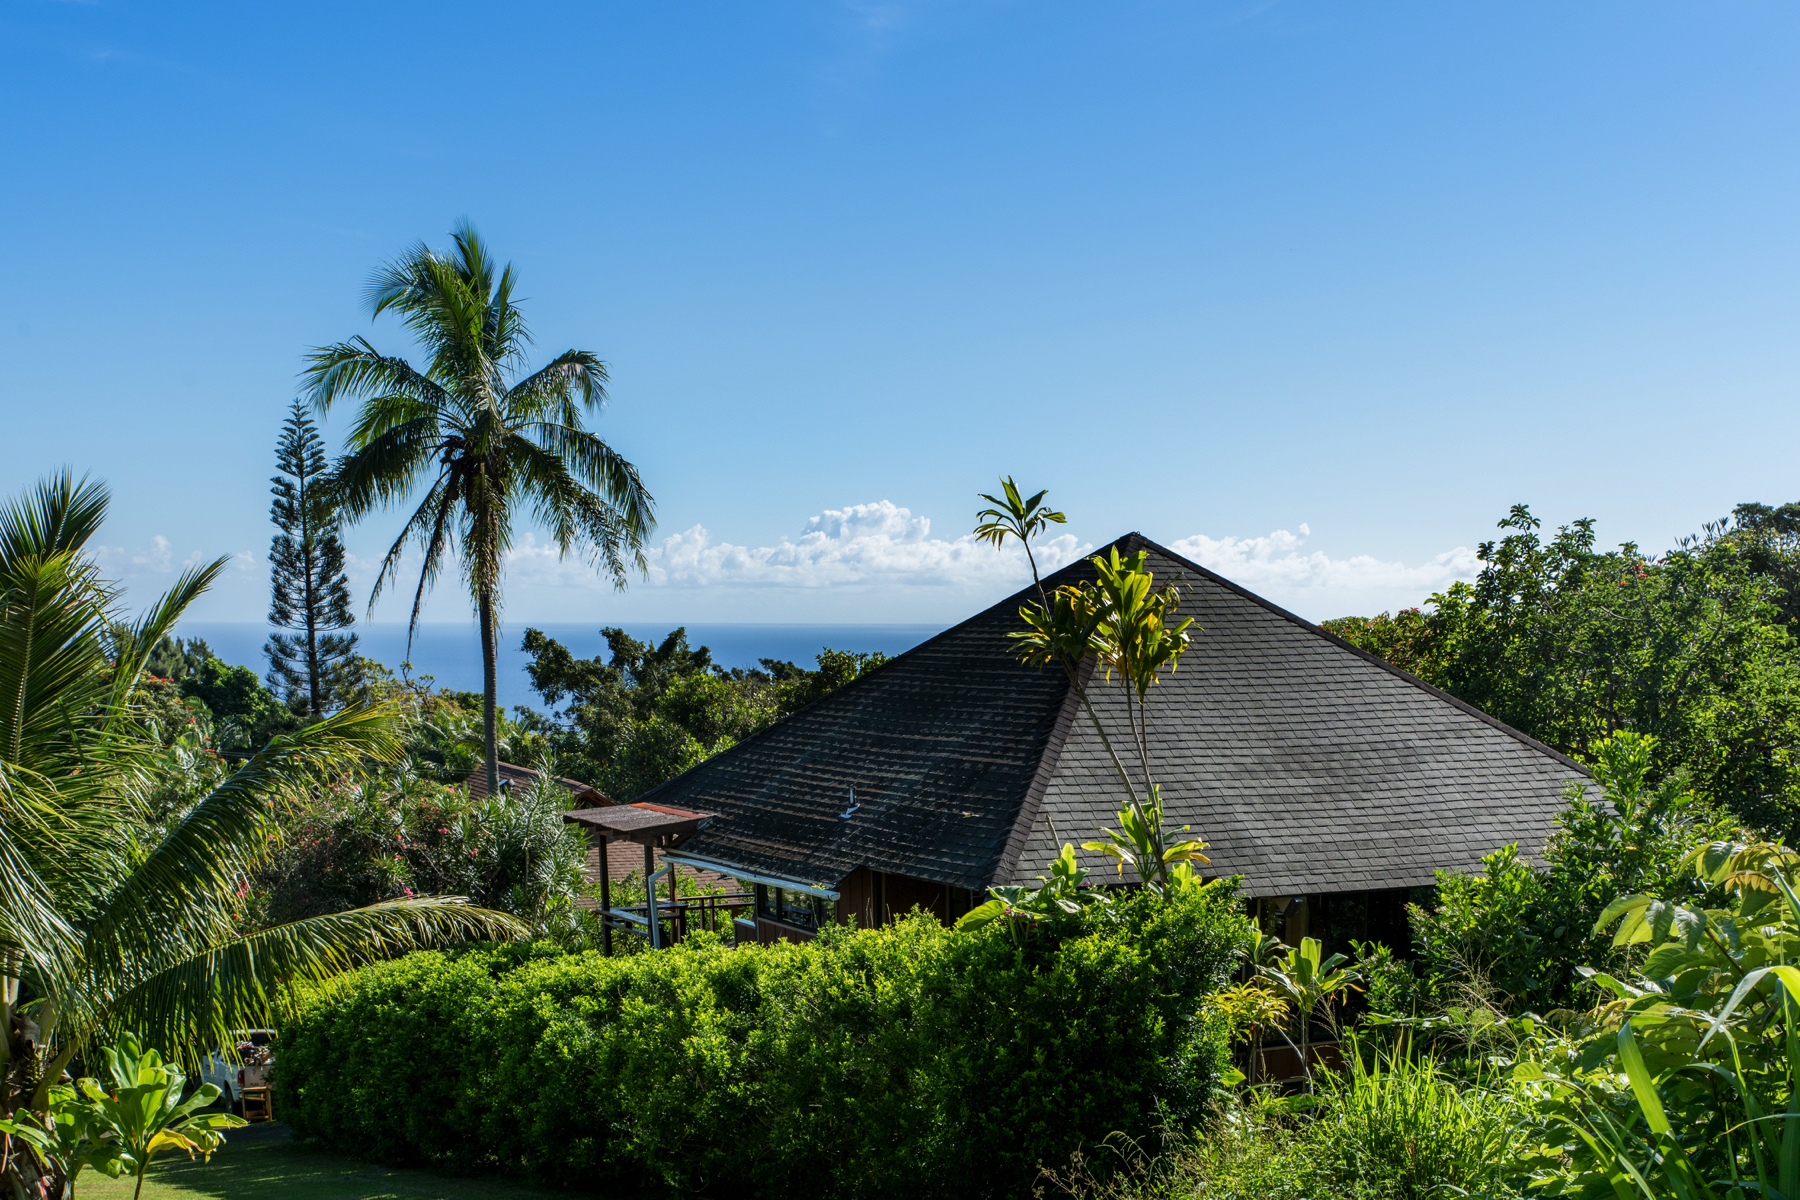 Single Family Homes for Active at 48-5453 Kukuihaele Rd. Honokaa, Hawaii 96727 United States